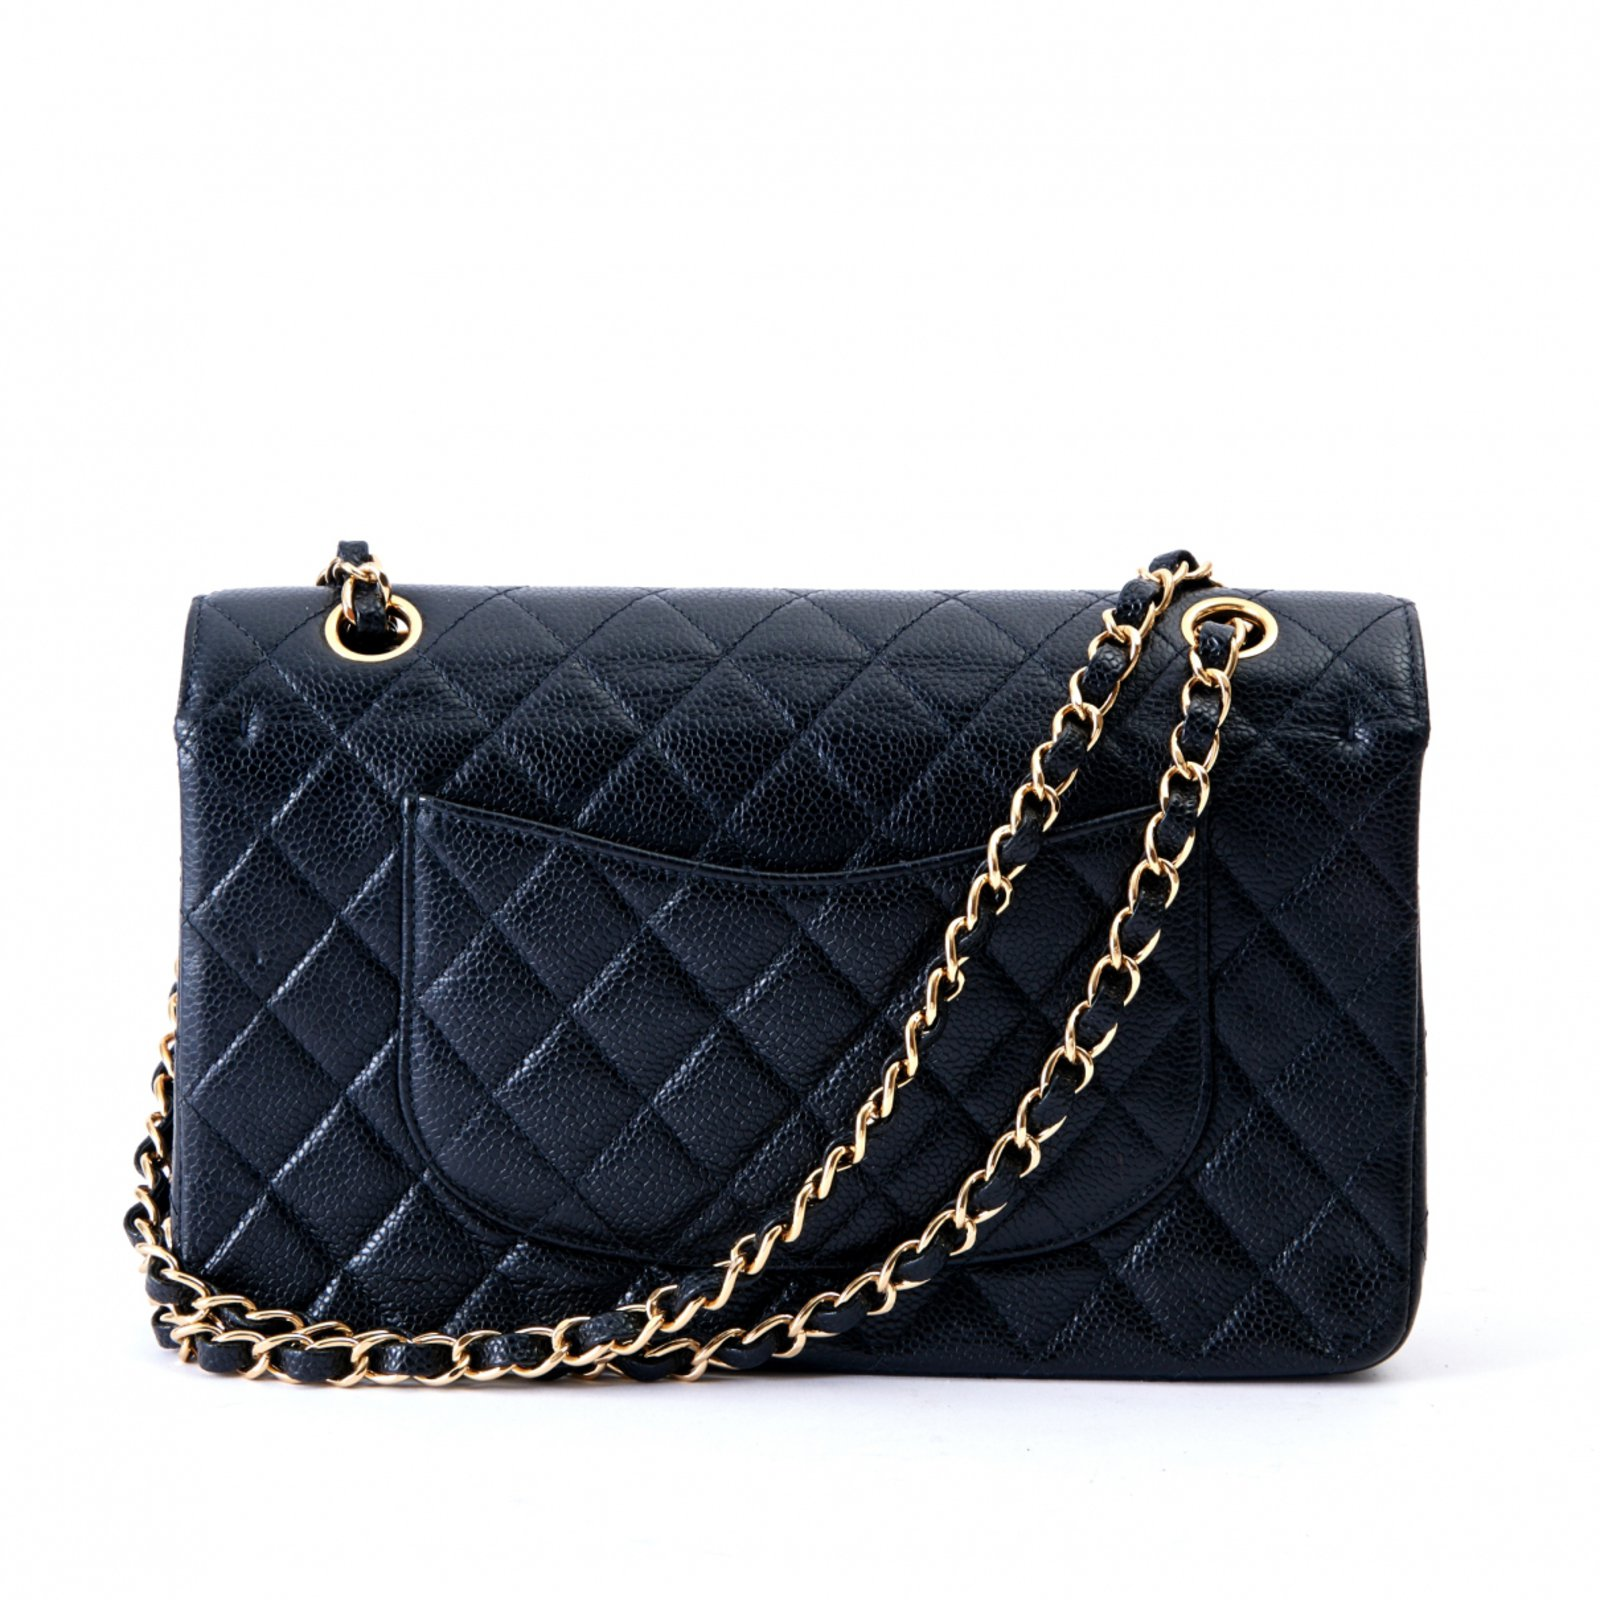 2a76bc561cef Chanel TIMELESS CLASSIC 25 BLACK CAVIAR Handbags Leather Black ref ...